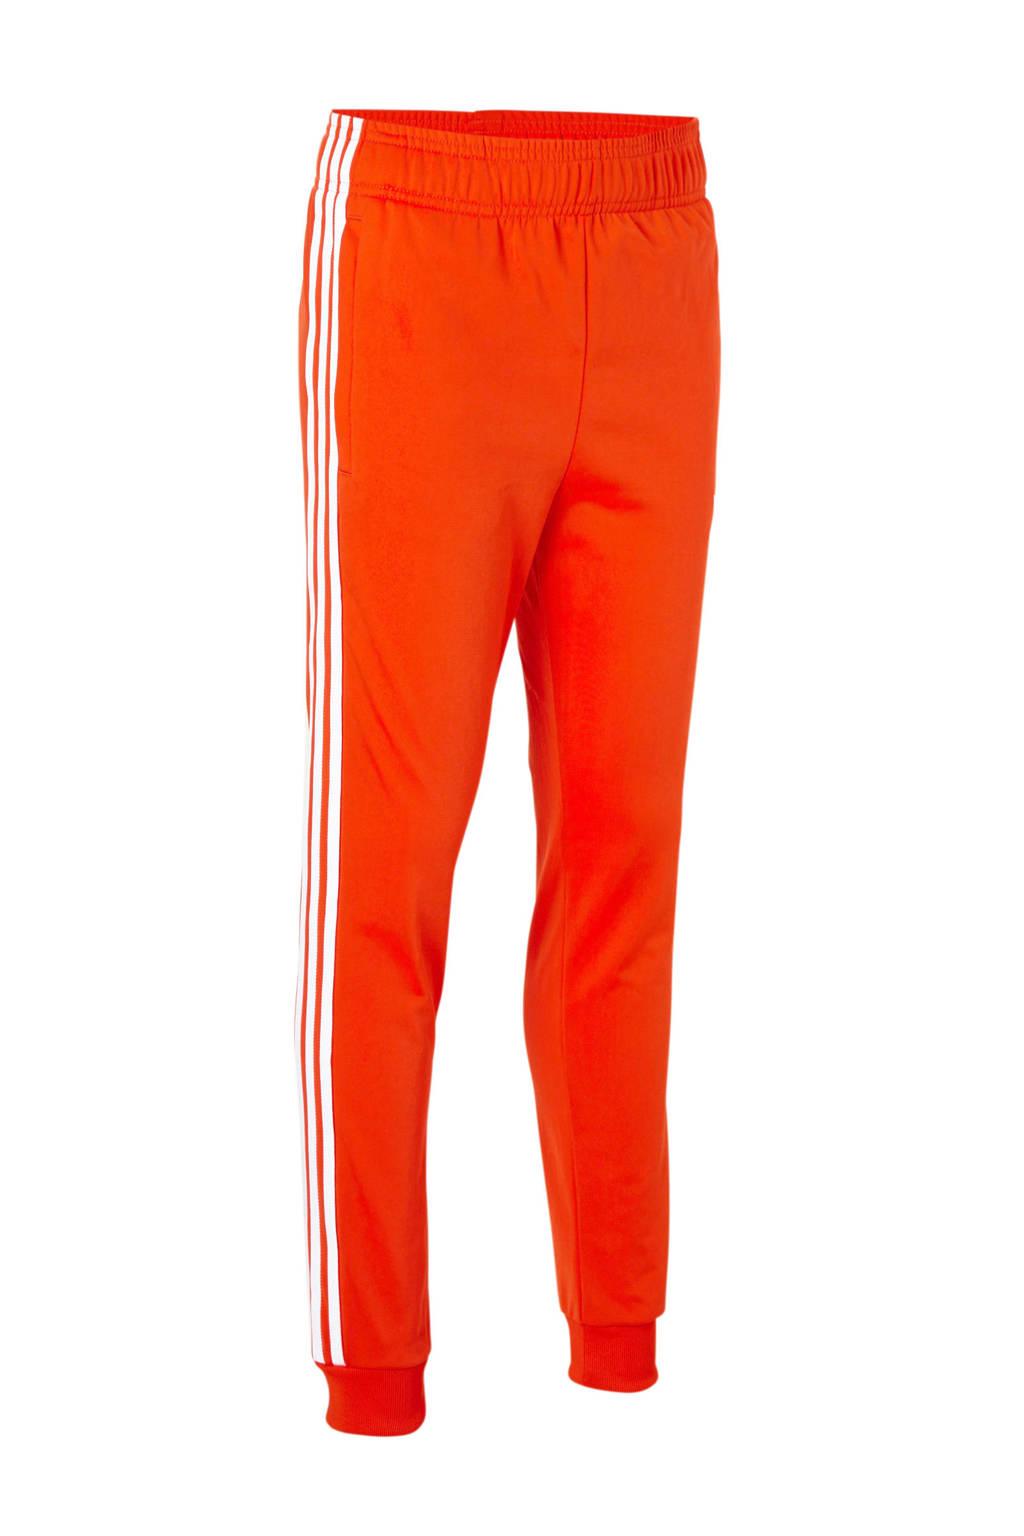 adidas originals   trainingsbroek oranje, Oranje